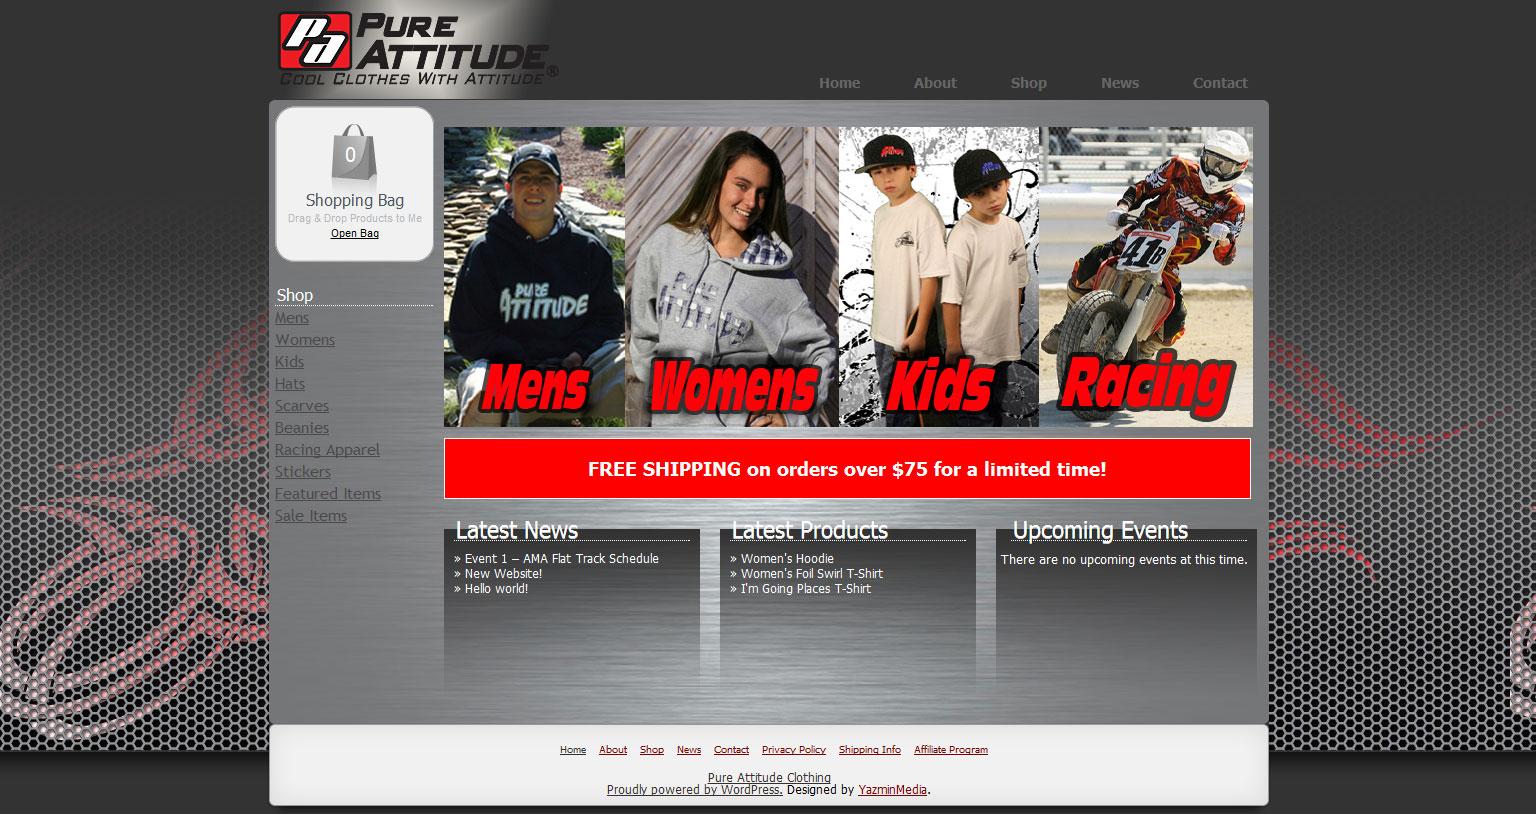 Website Migration: Pure Attitude